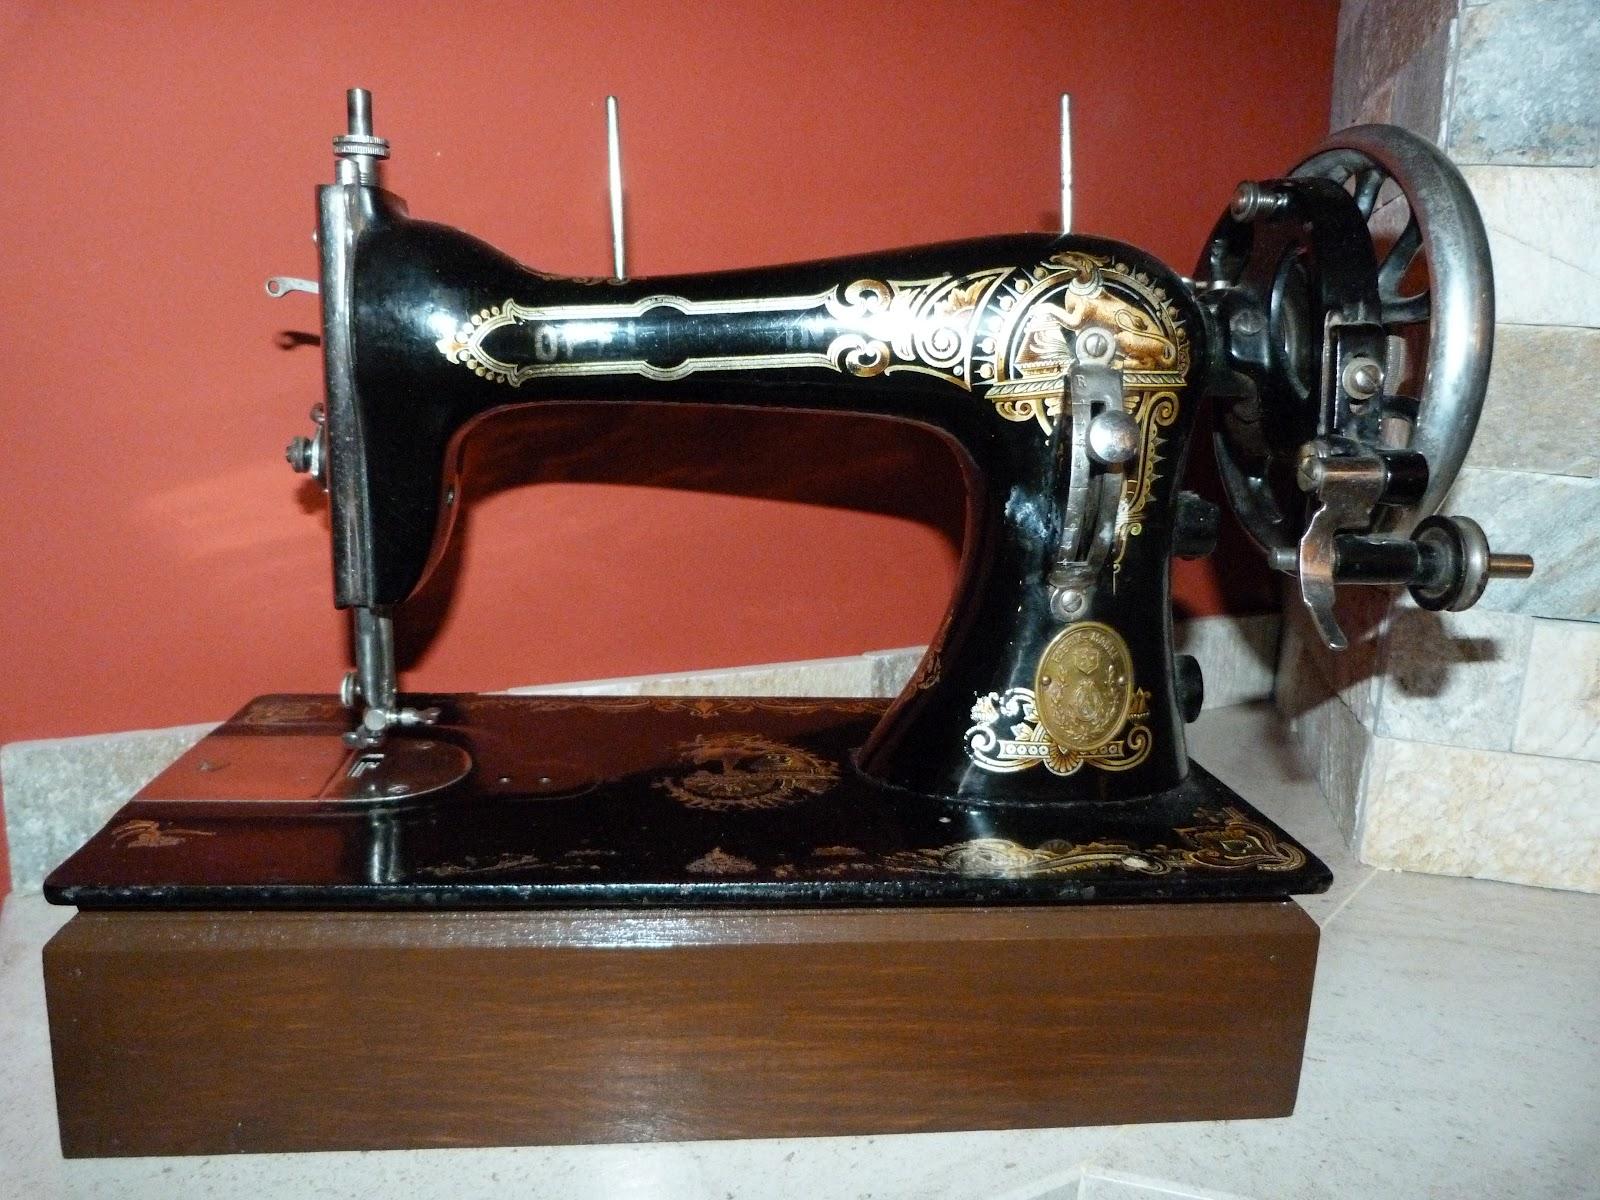 Objetos antiguos gallery for Compra de objetos antiguos